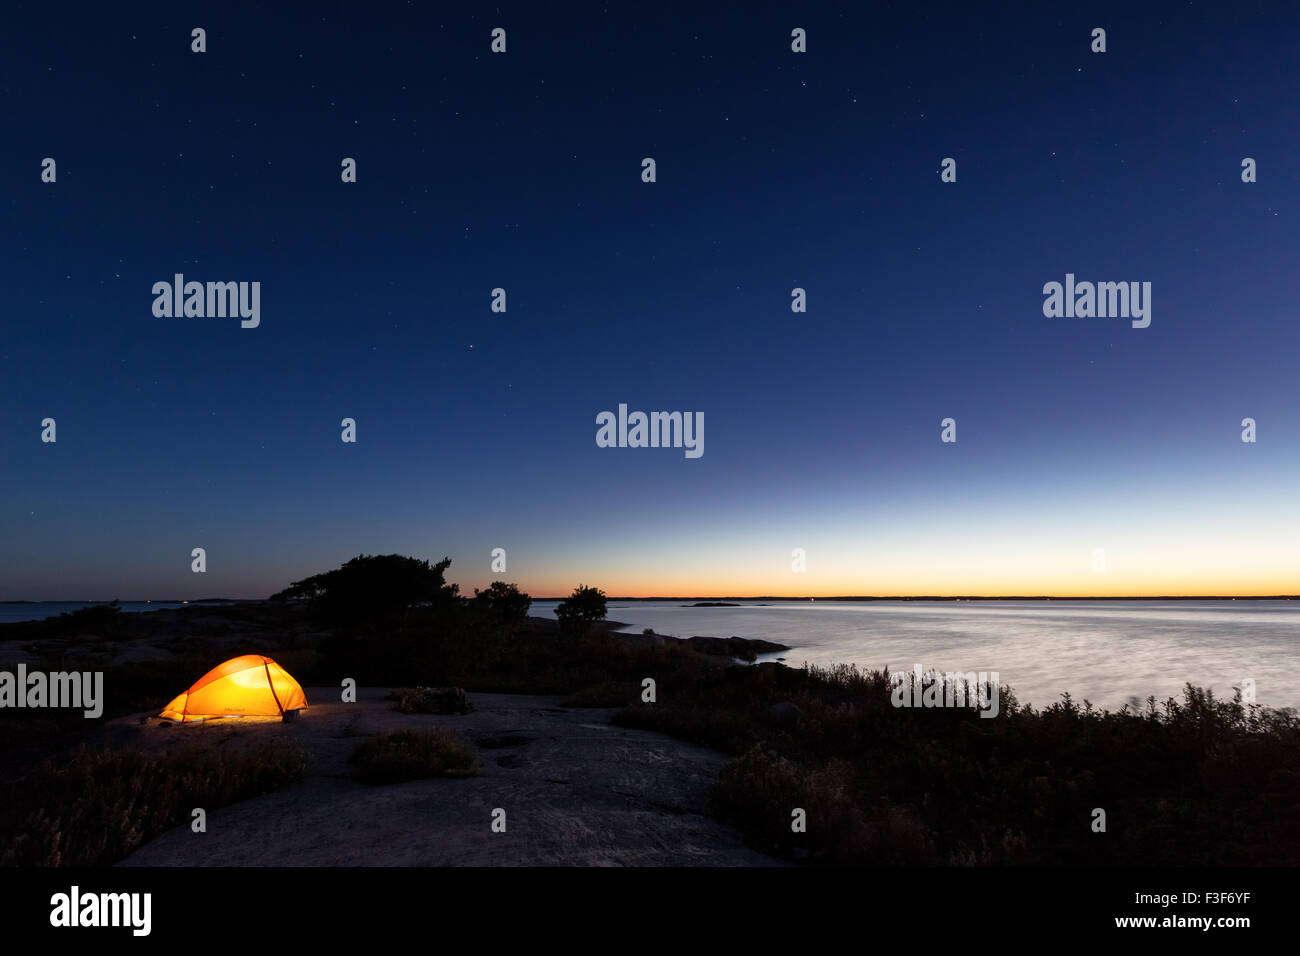 La noche llega a la isla Örskär, Espoo, Finlandia, Europa, UE Foto de stock